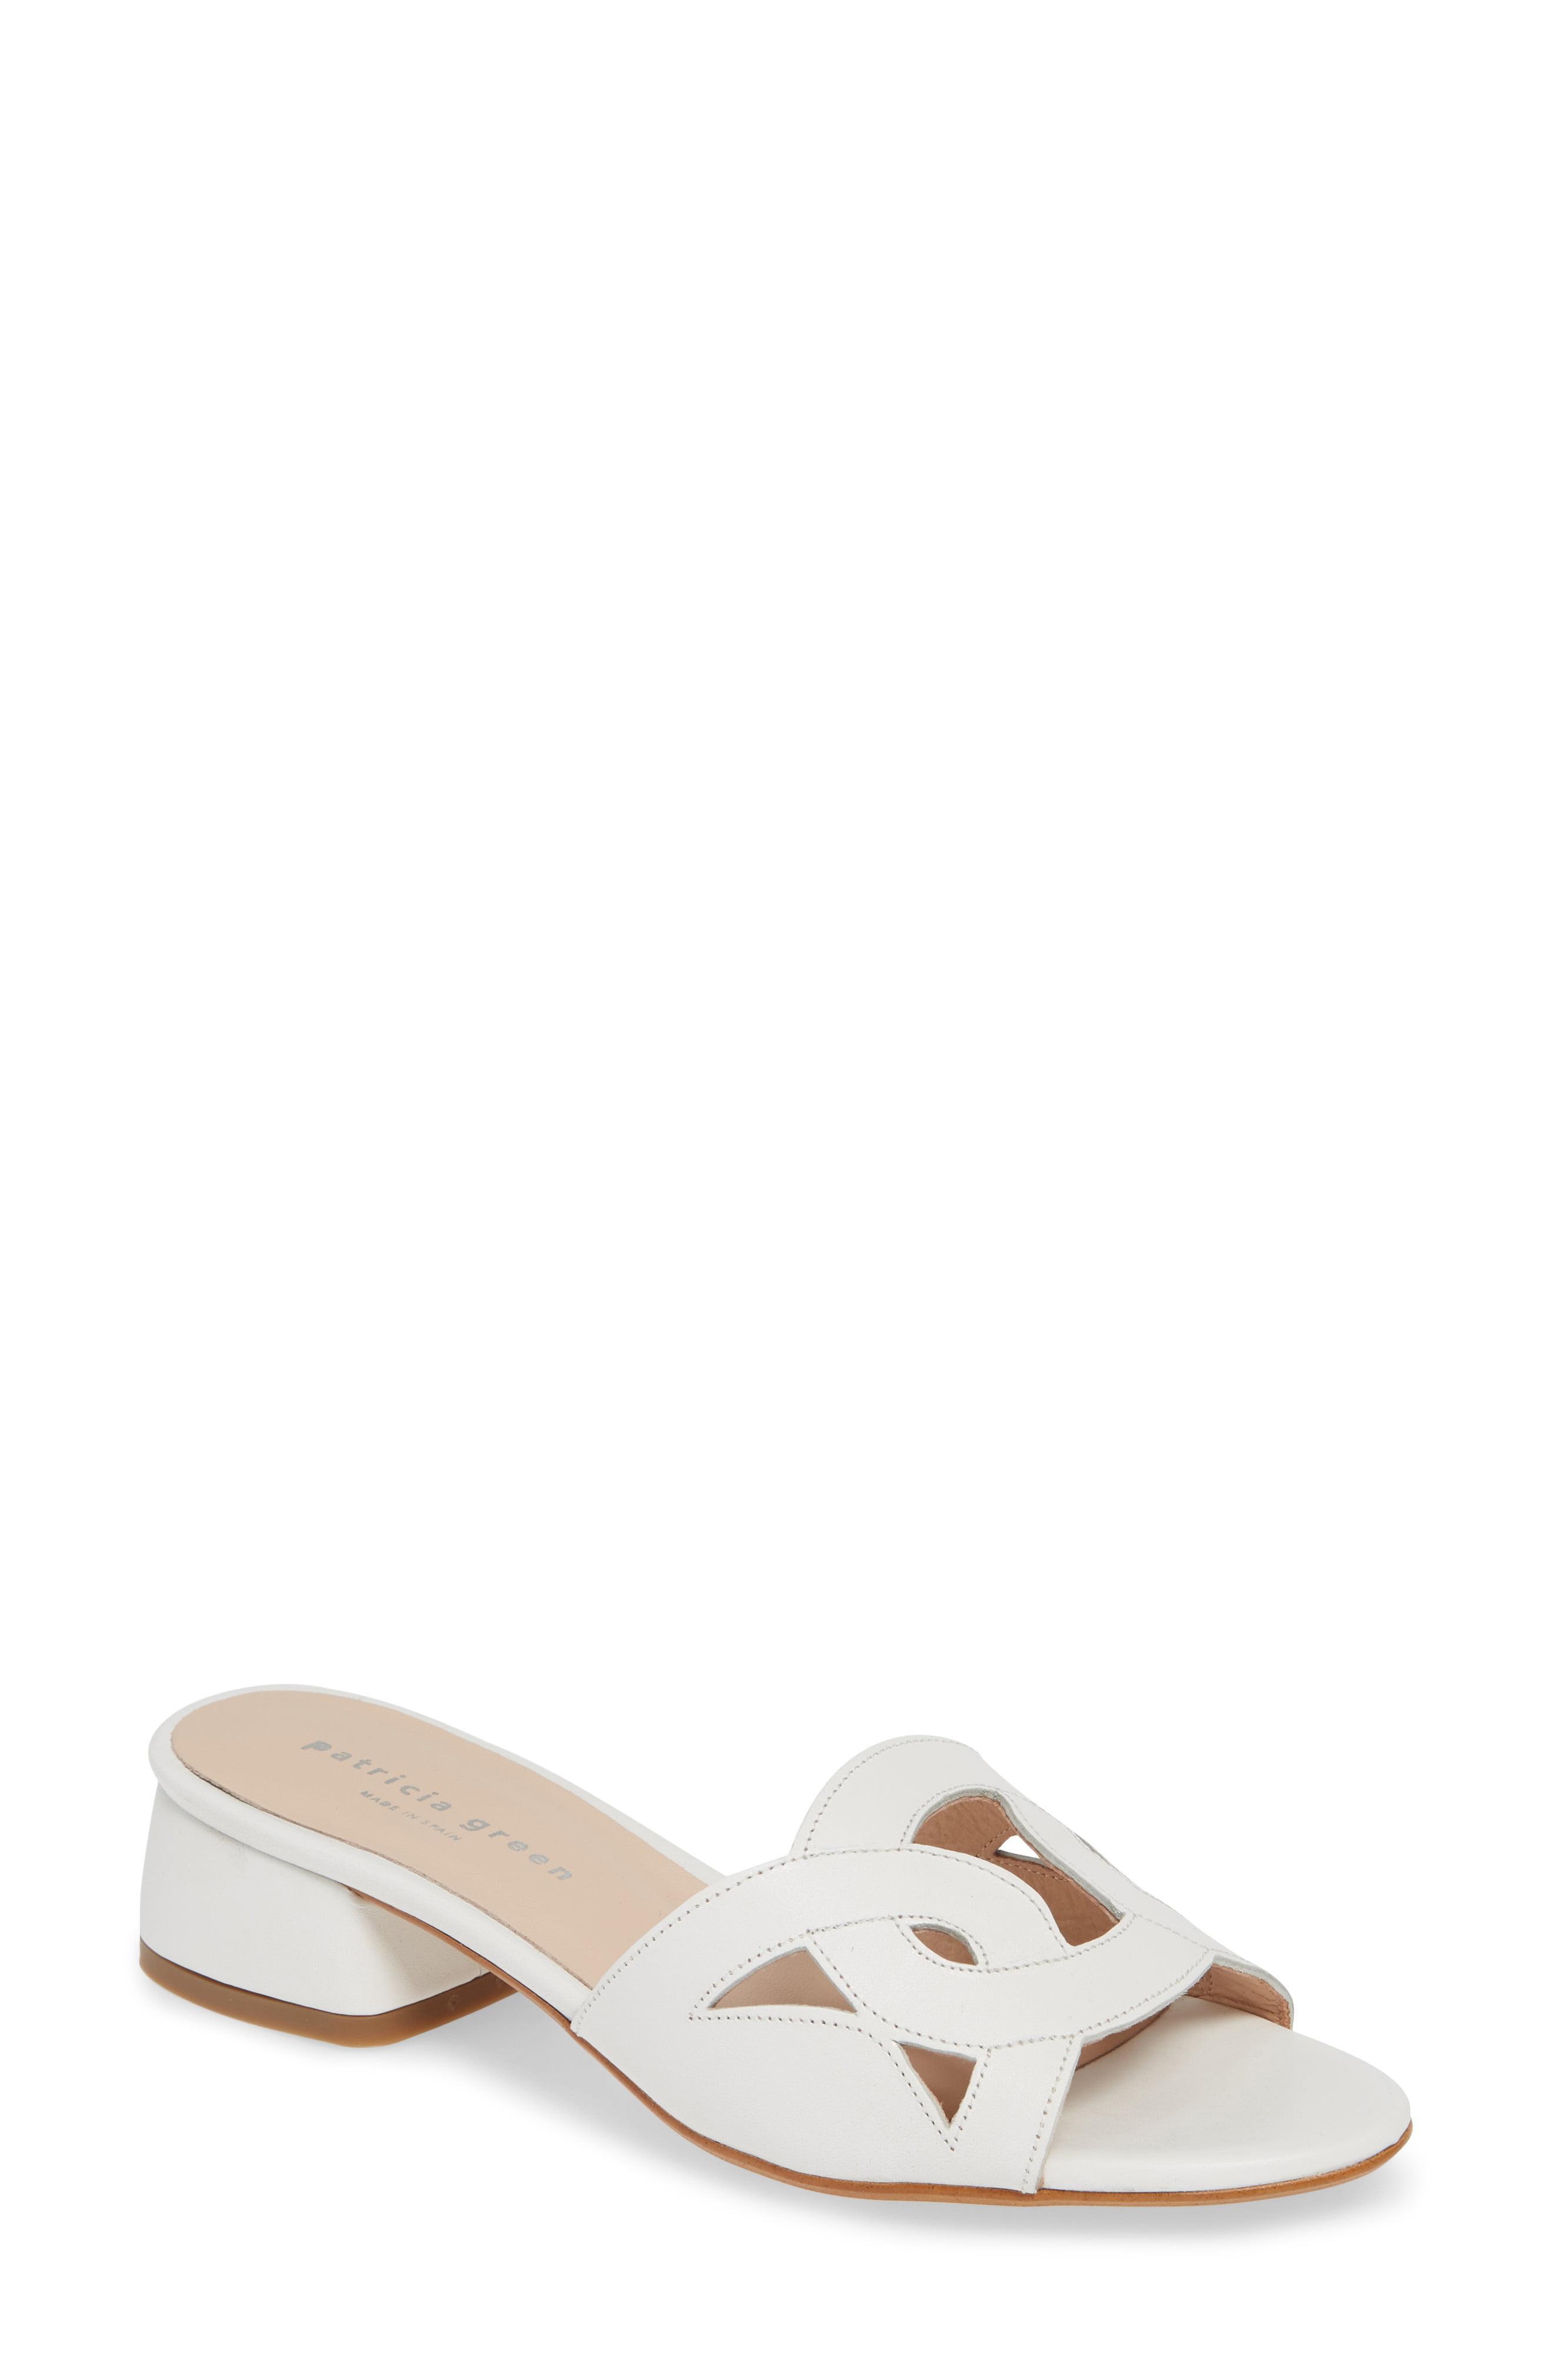 15871e390da Lyst - Patricia Green Boca Slide Sandal in White